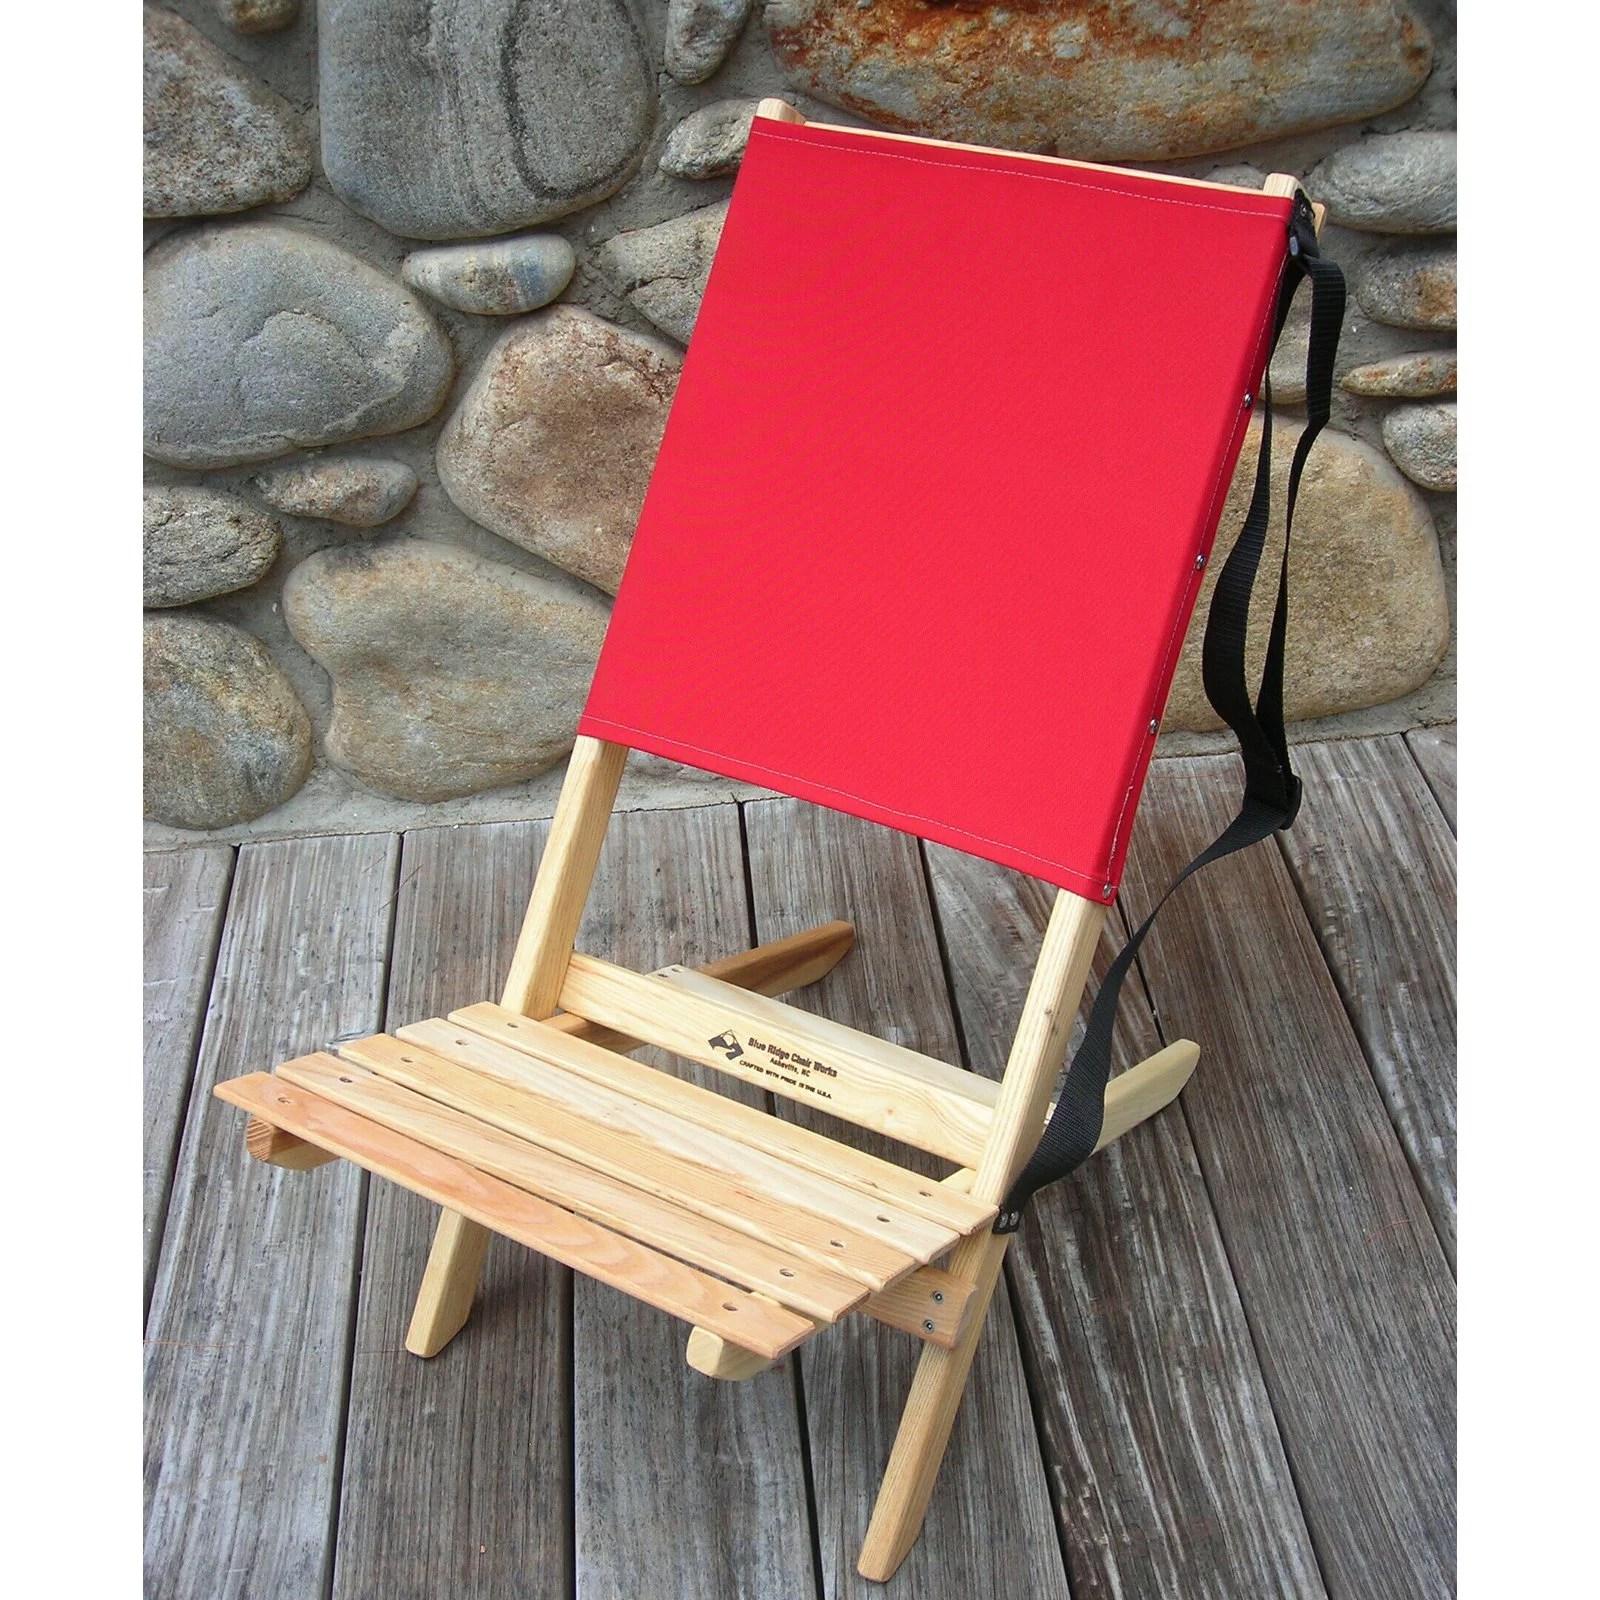 walmart lawn chair steelcase think blue ridge low seat com